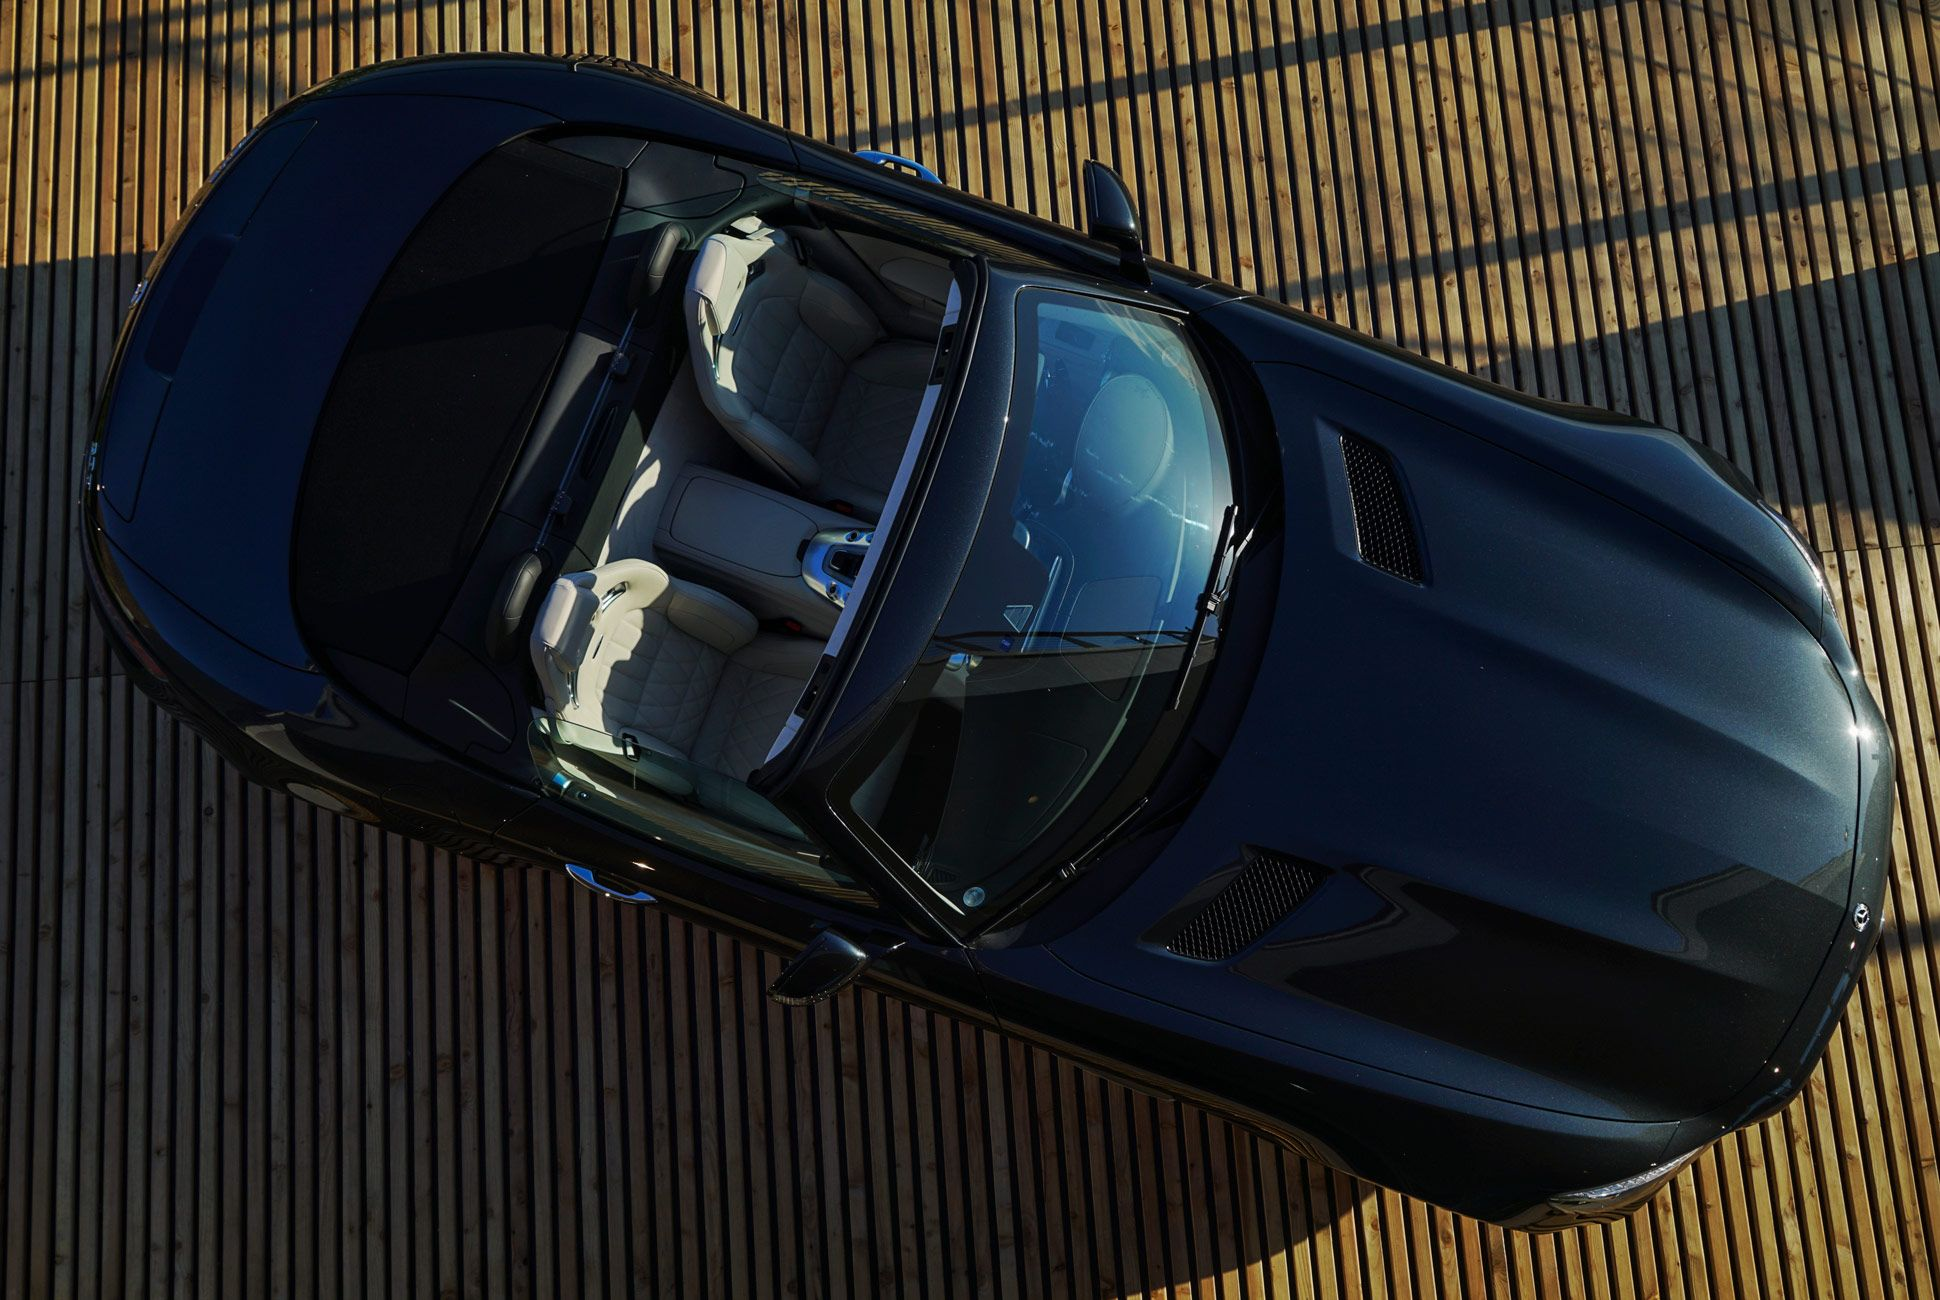 Mercedes-Benz-AMG-GT-C-Gear-Patrol-Ambiance-Slide-1